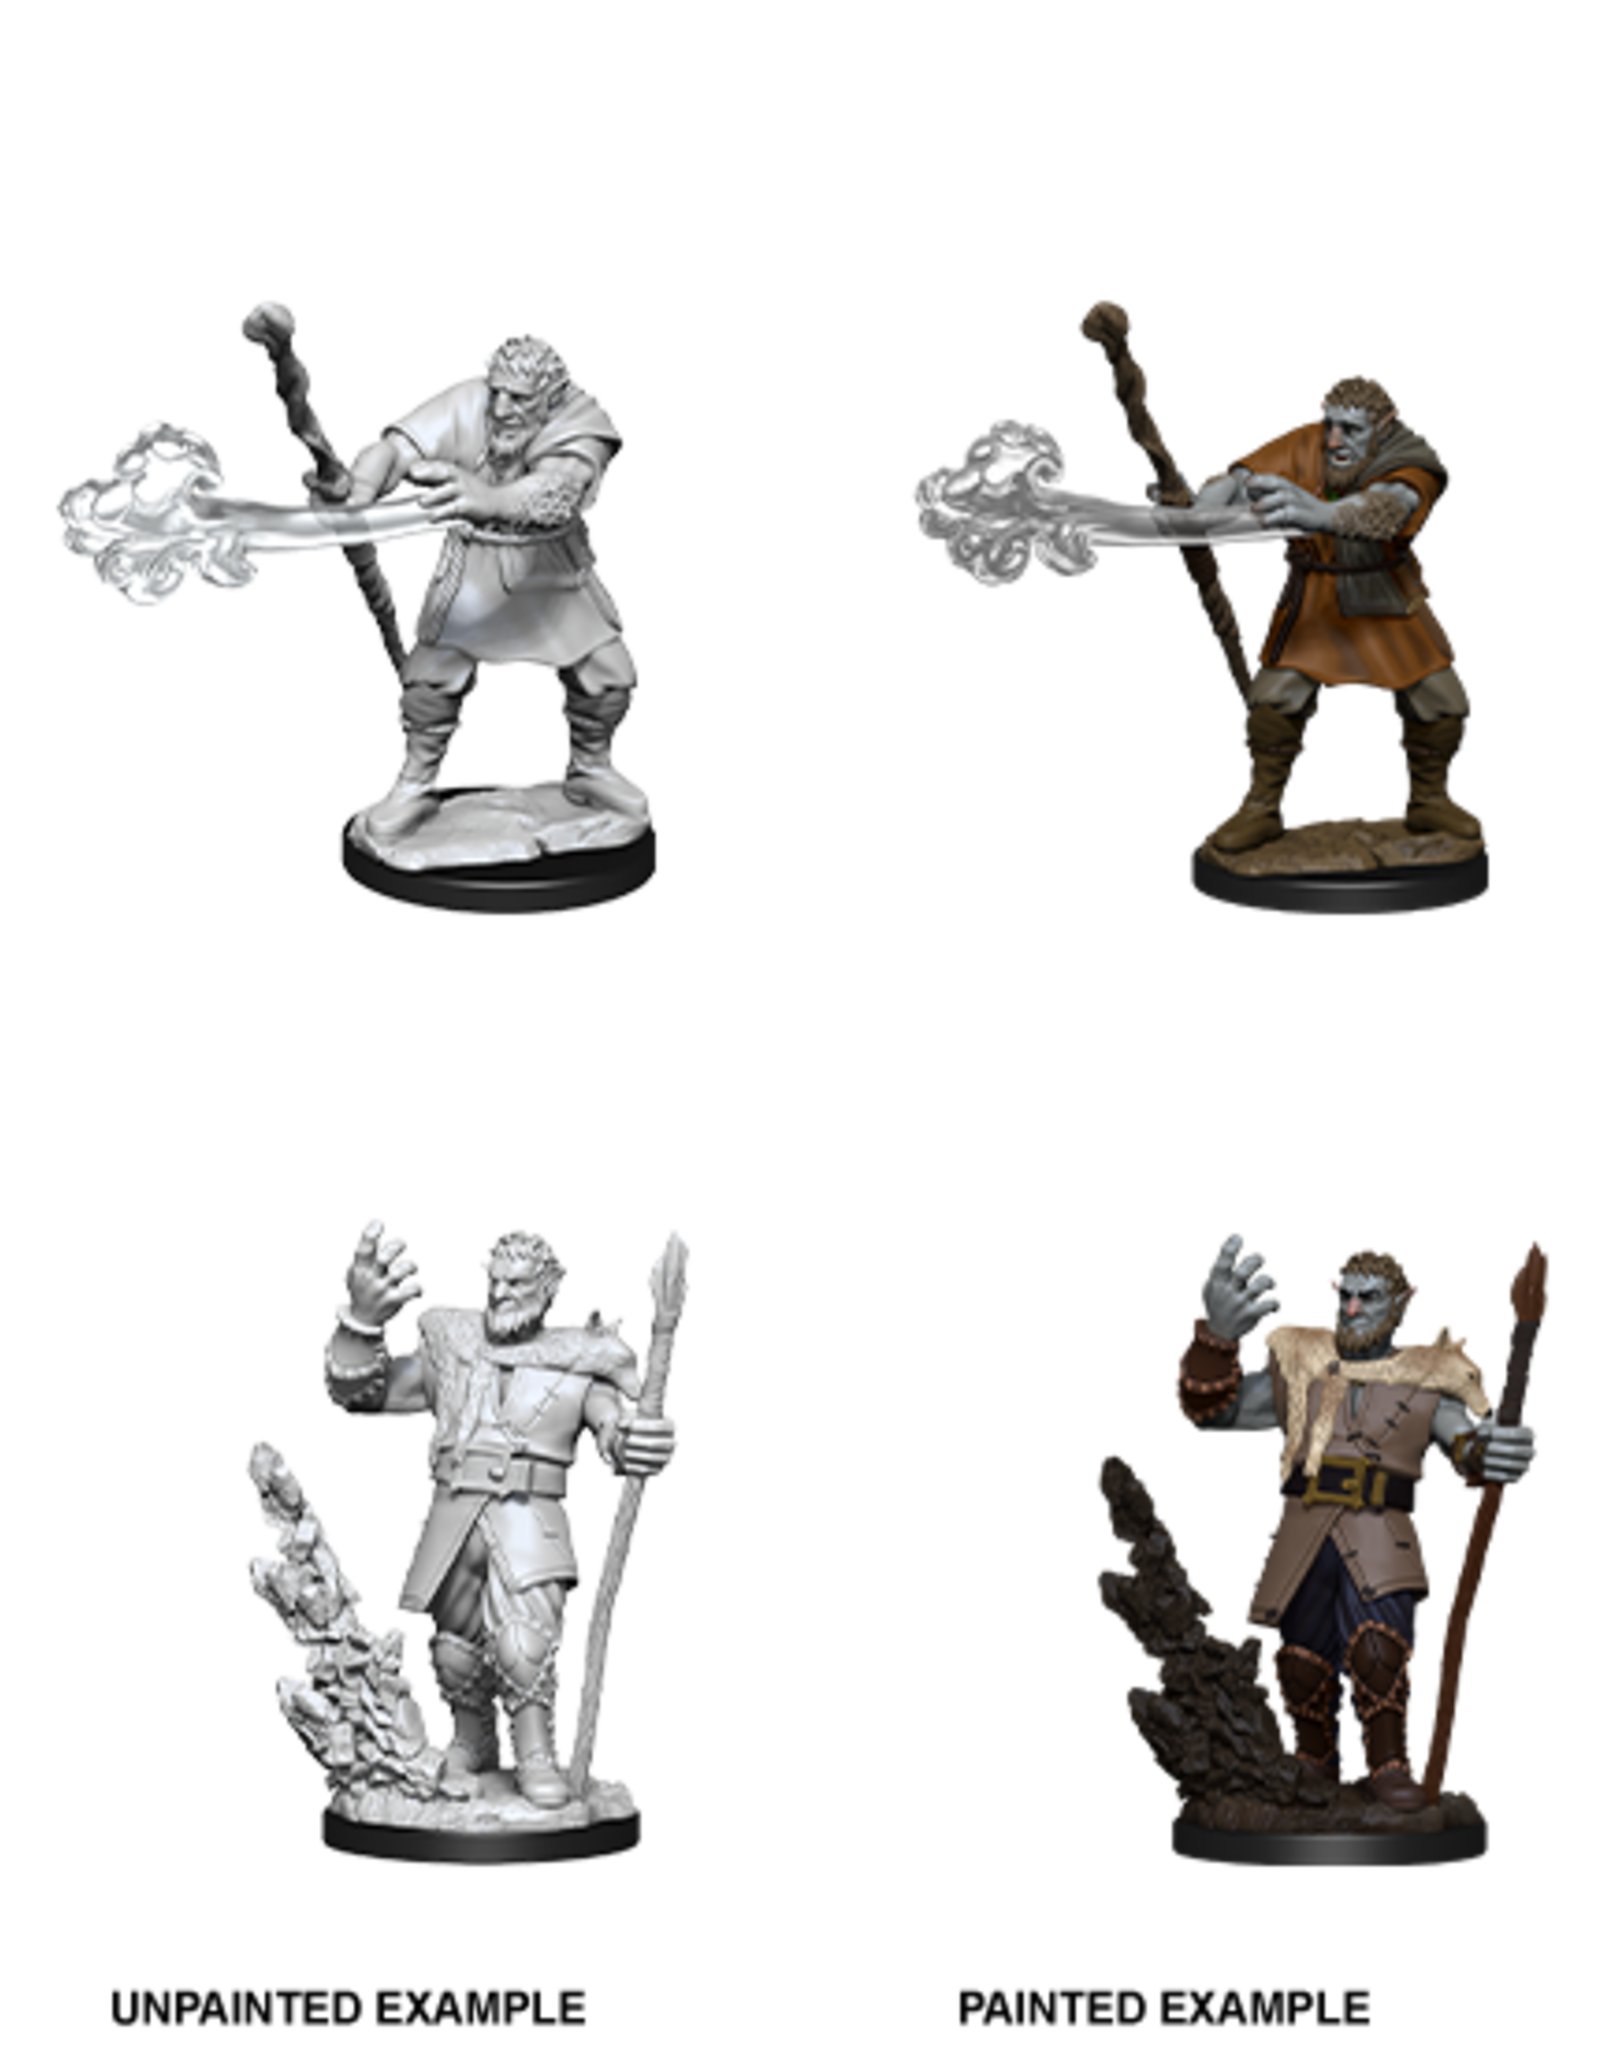 Wizkids D&D Nolzur's Marvelous Miniatures Firbolg Druid